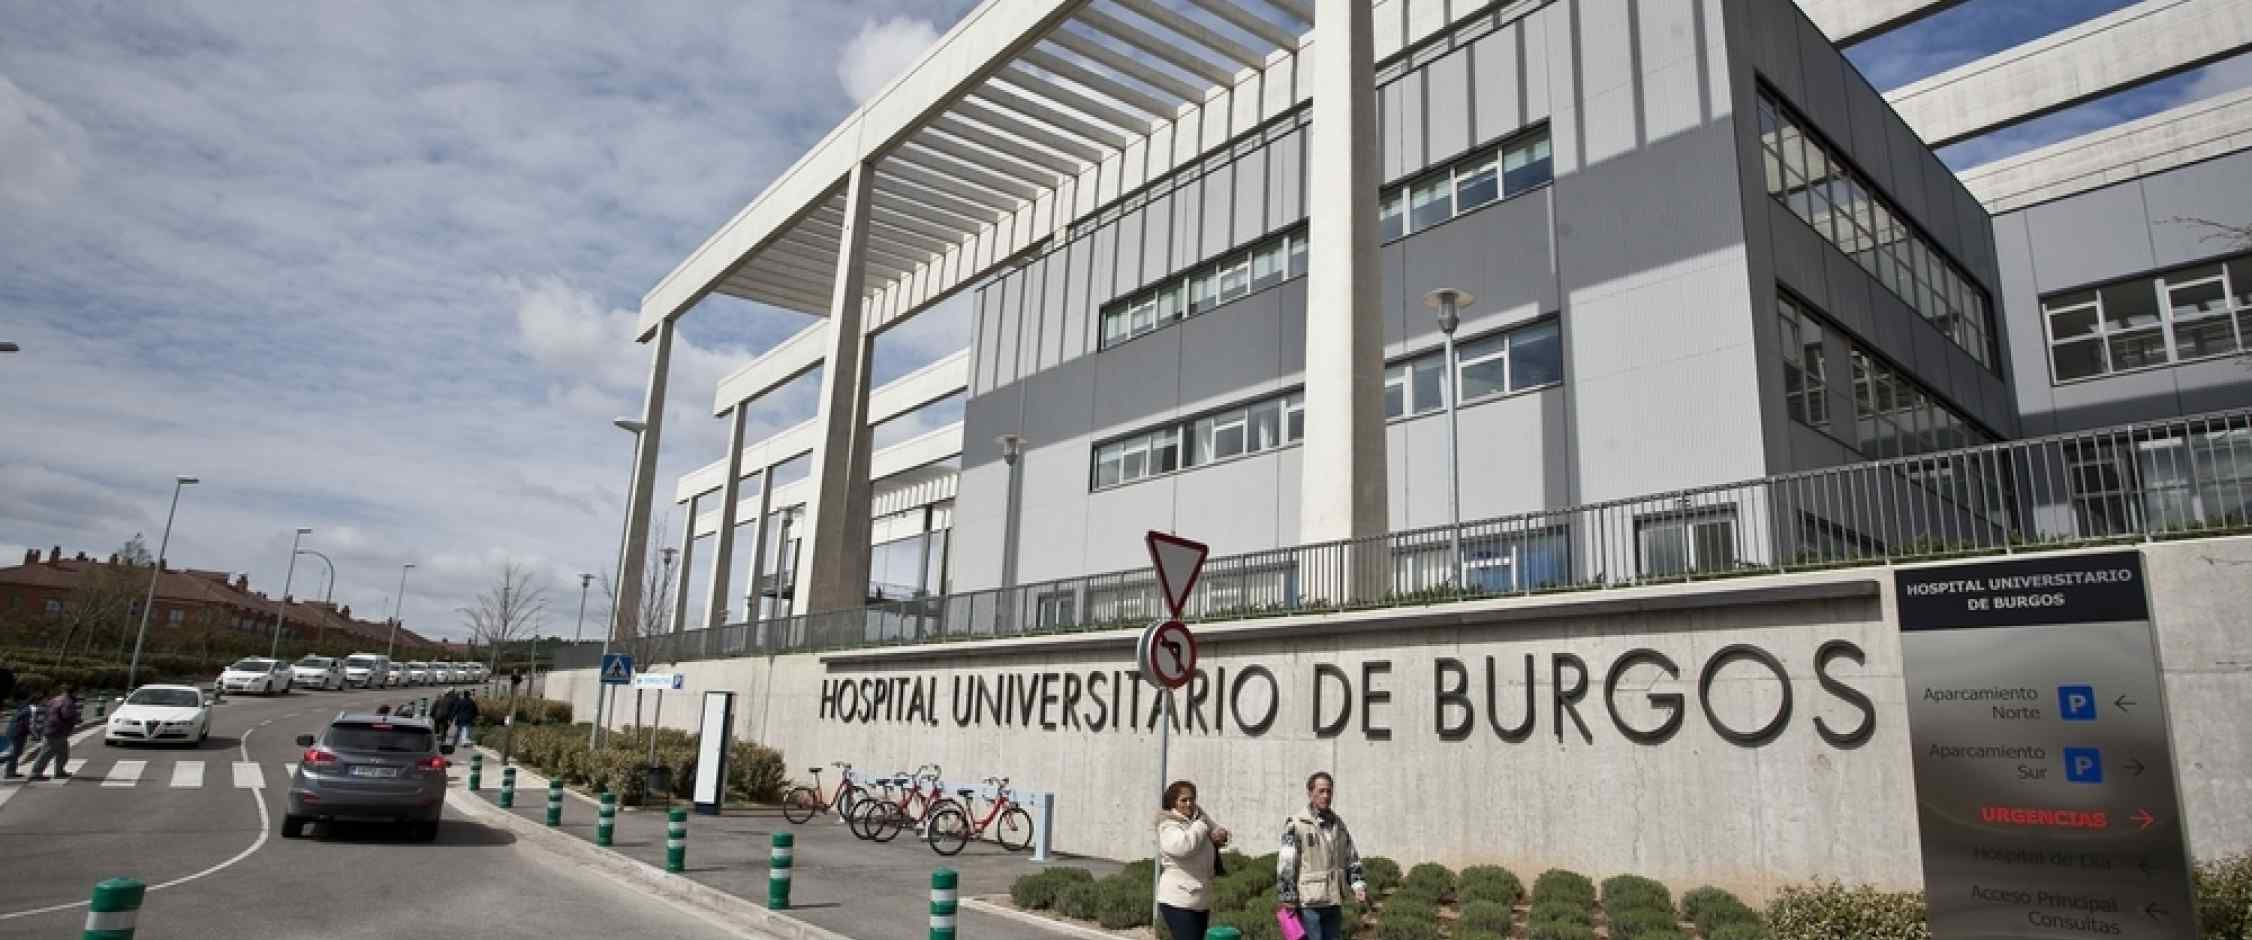 hospital-universitario-burgos-1